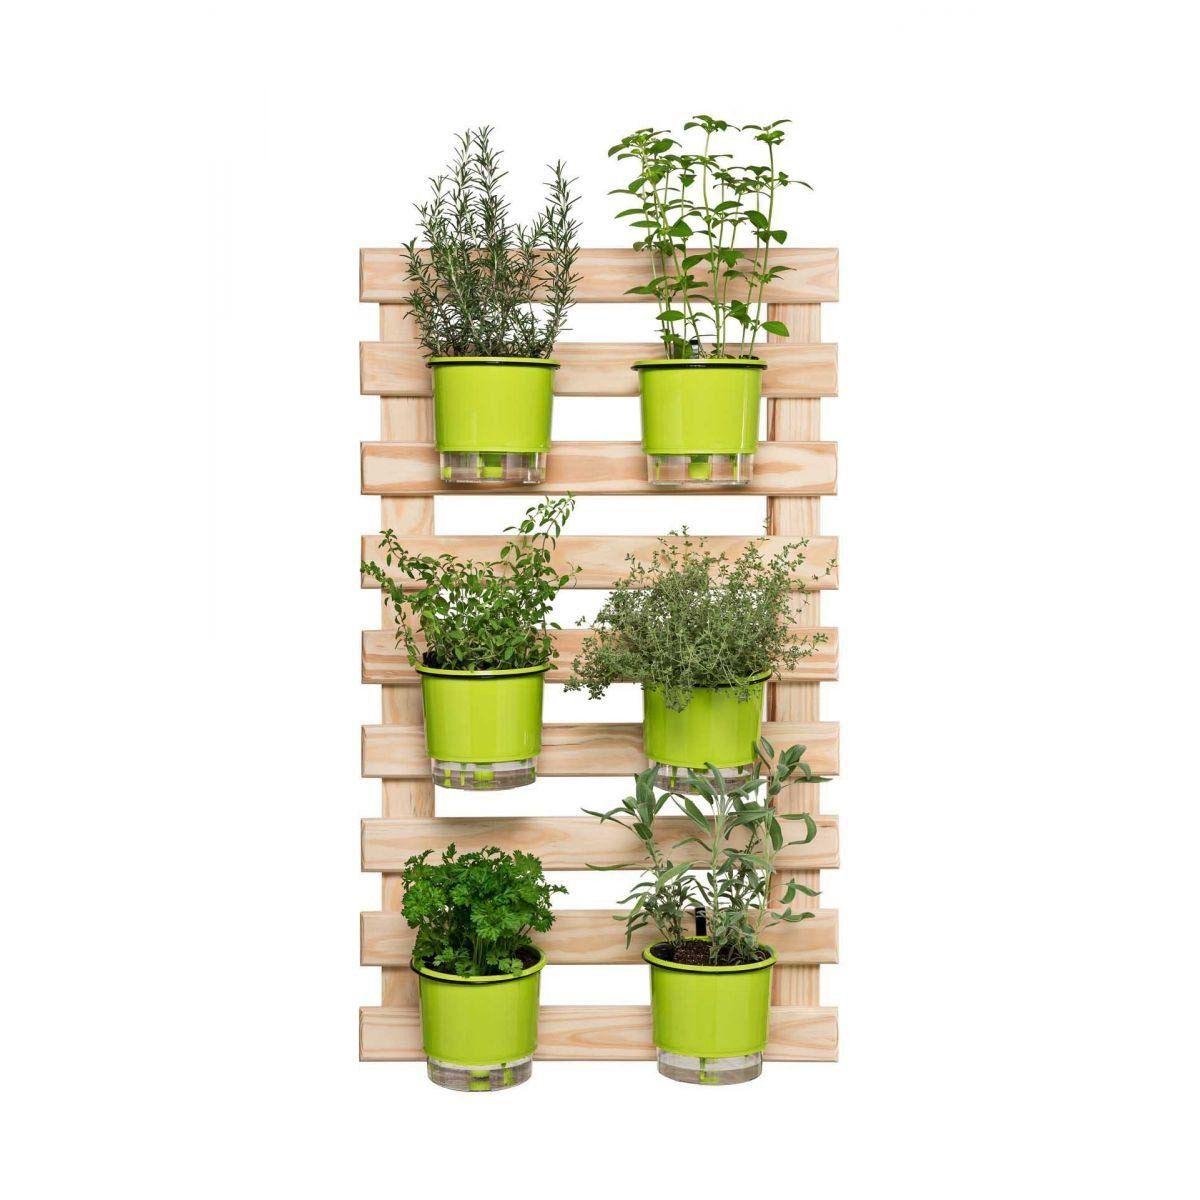 Kit Horta Vertical Green 100cm x 60cm - (Treliça + 6 Vasos + 6 Suportes)